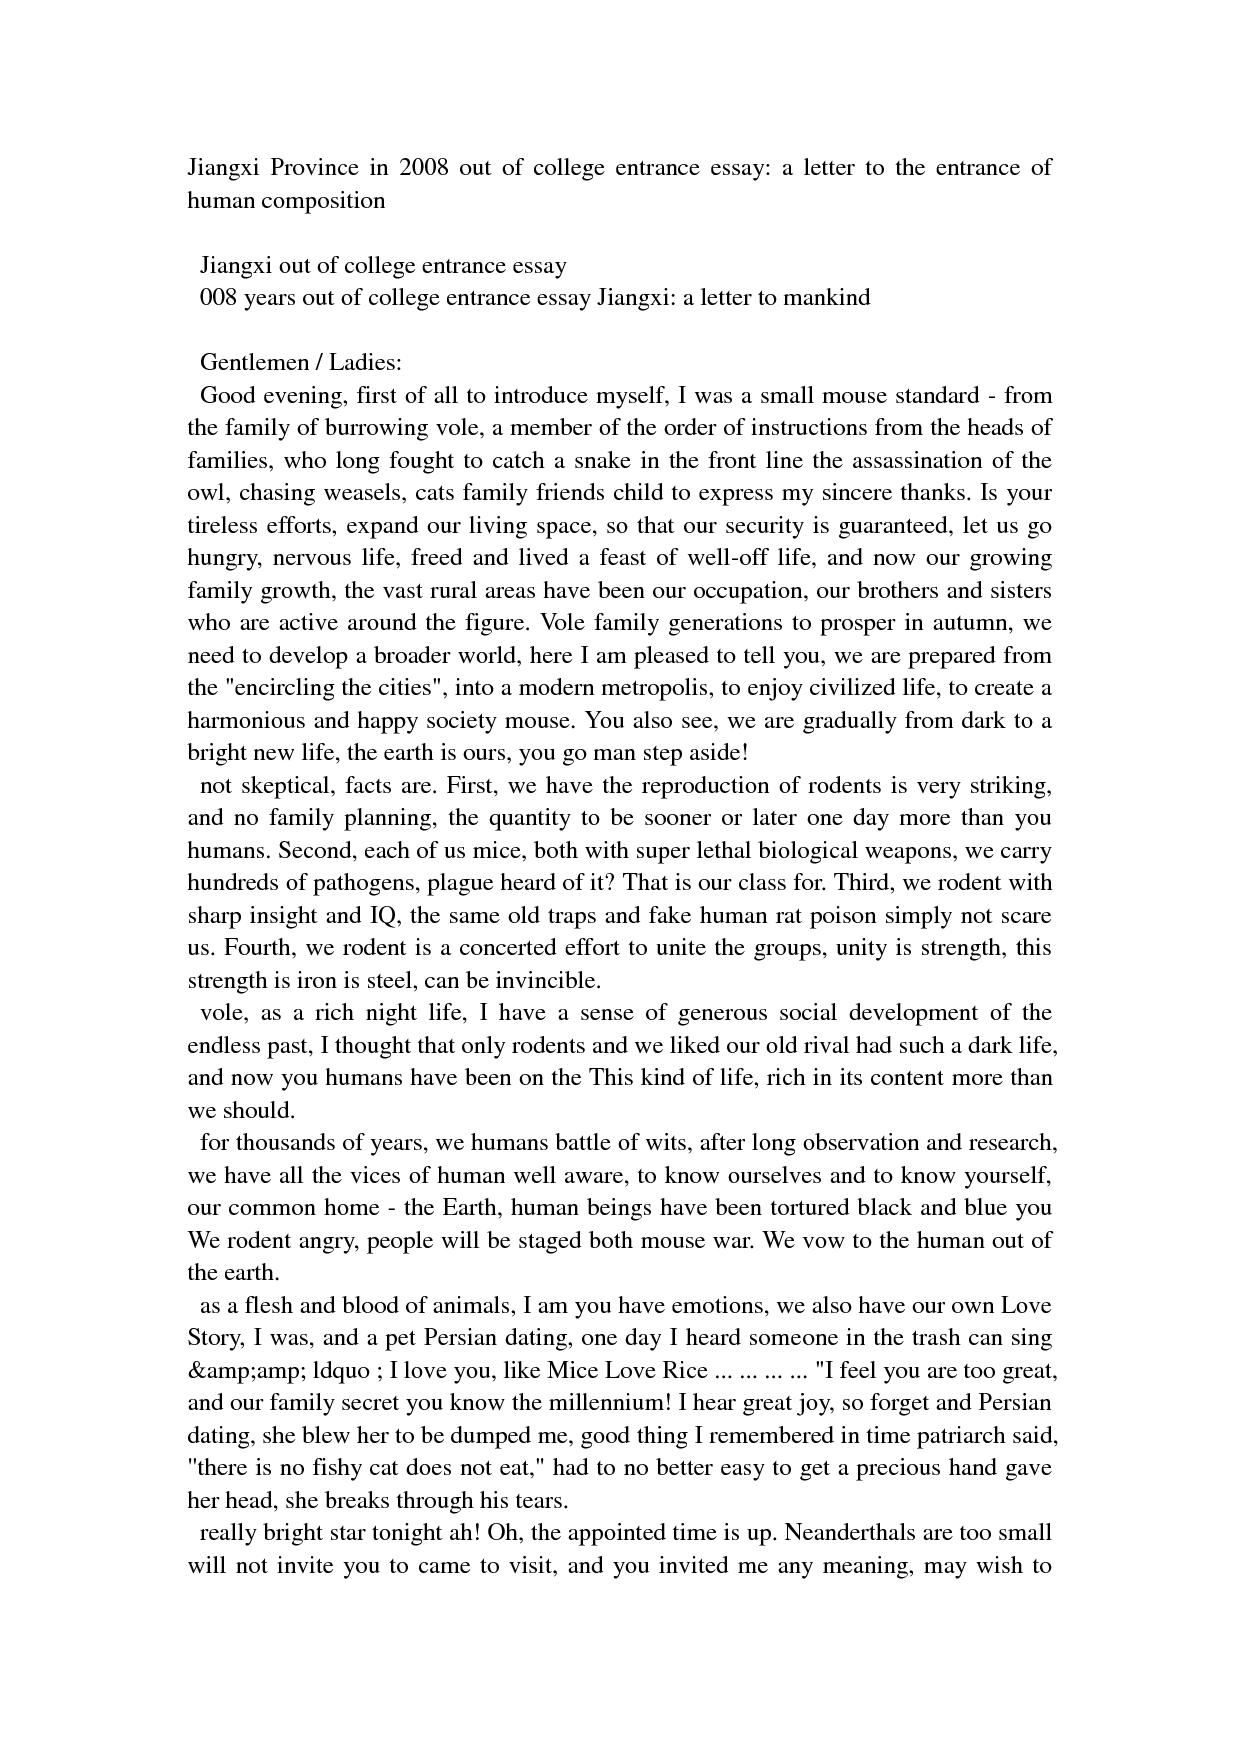 Pa school application essay